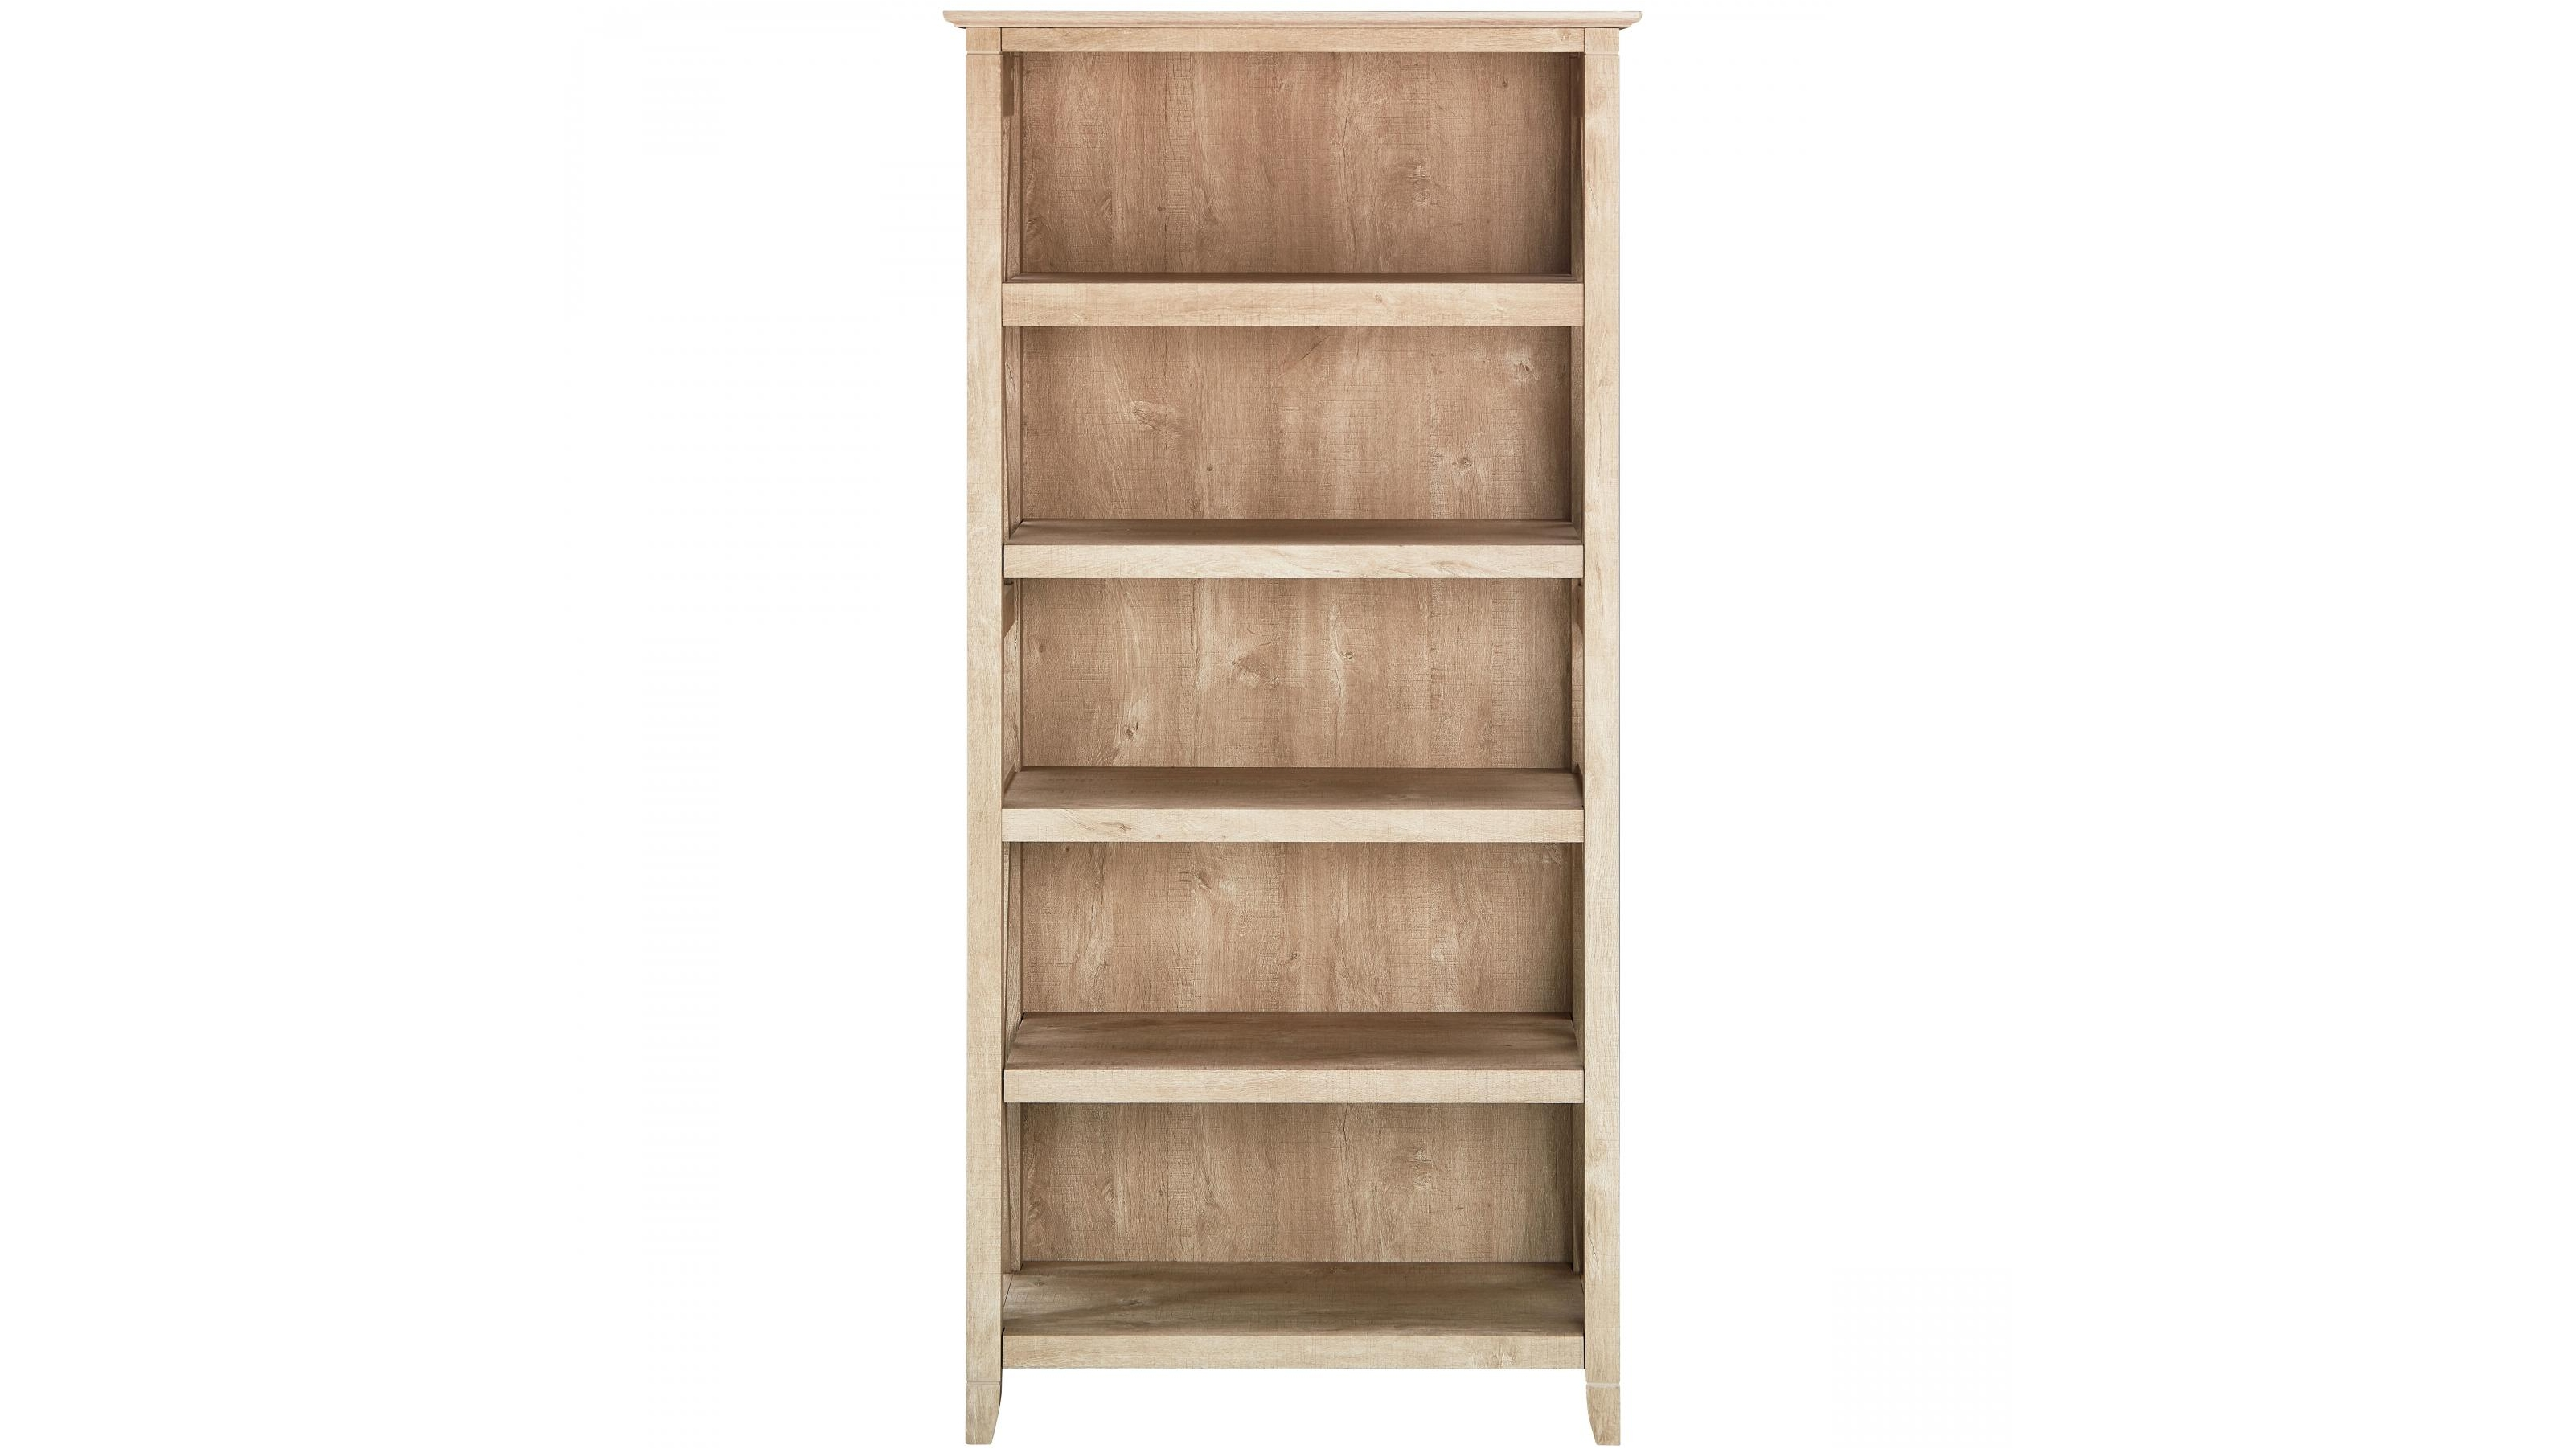 Buy Coastal Bookcase Harvey Norman Au